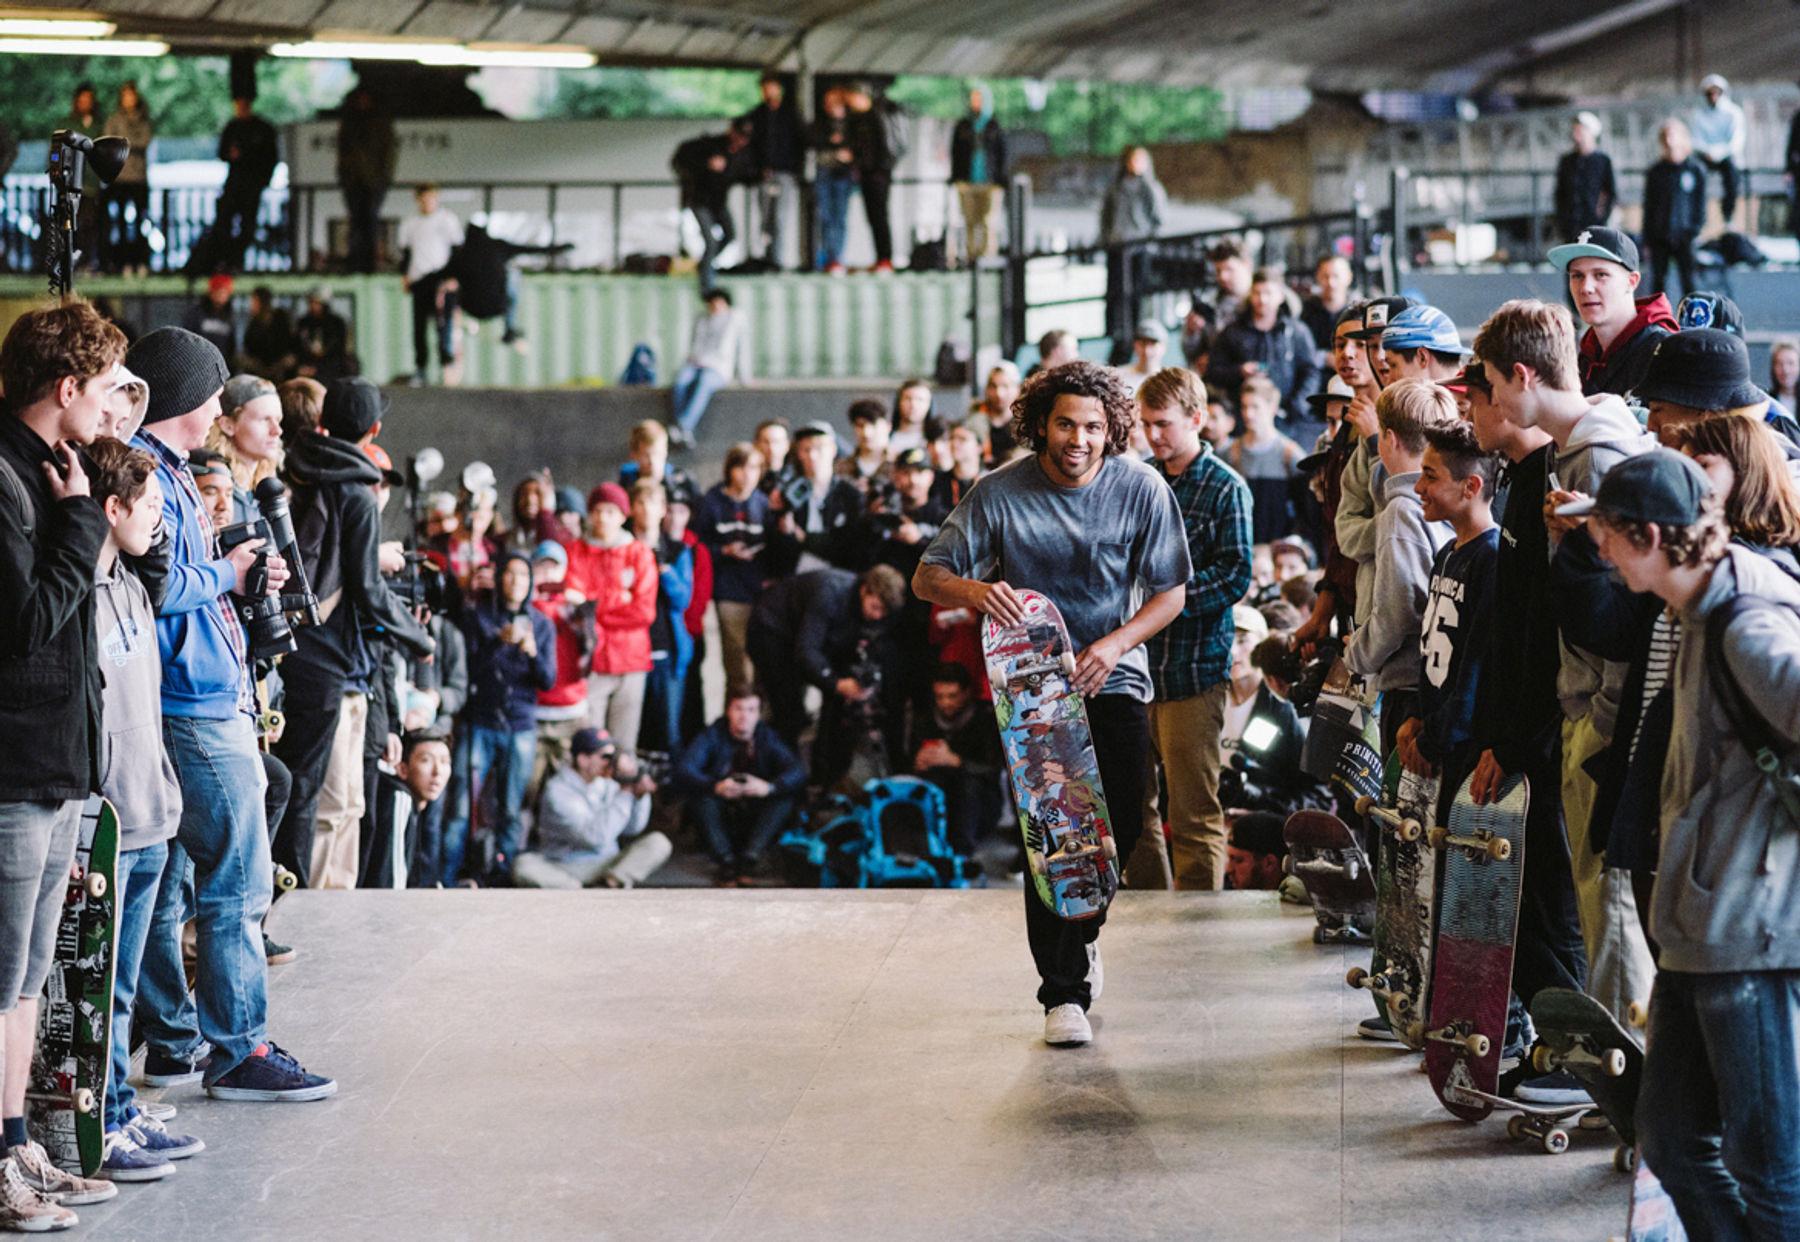 _IHC2688e-Paul-Rodriguez-Primitive-Skateboards-Demo-BaySixty6-London-May-2015-Photographer-Maksim-Kalanep